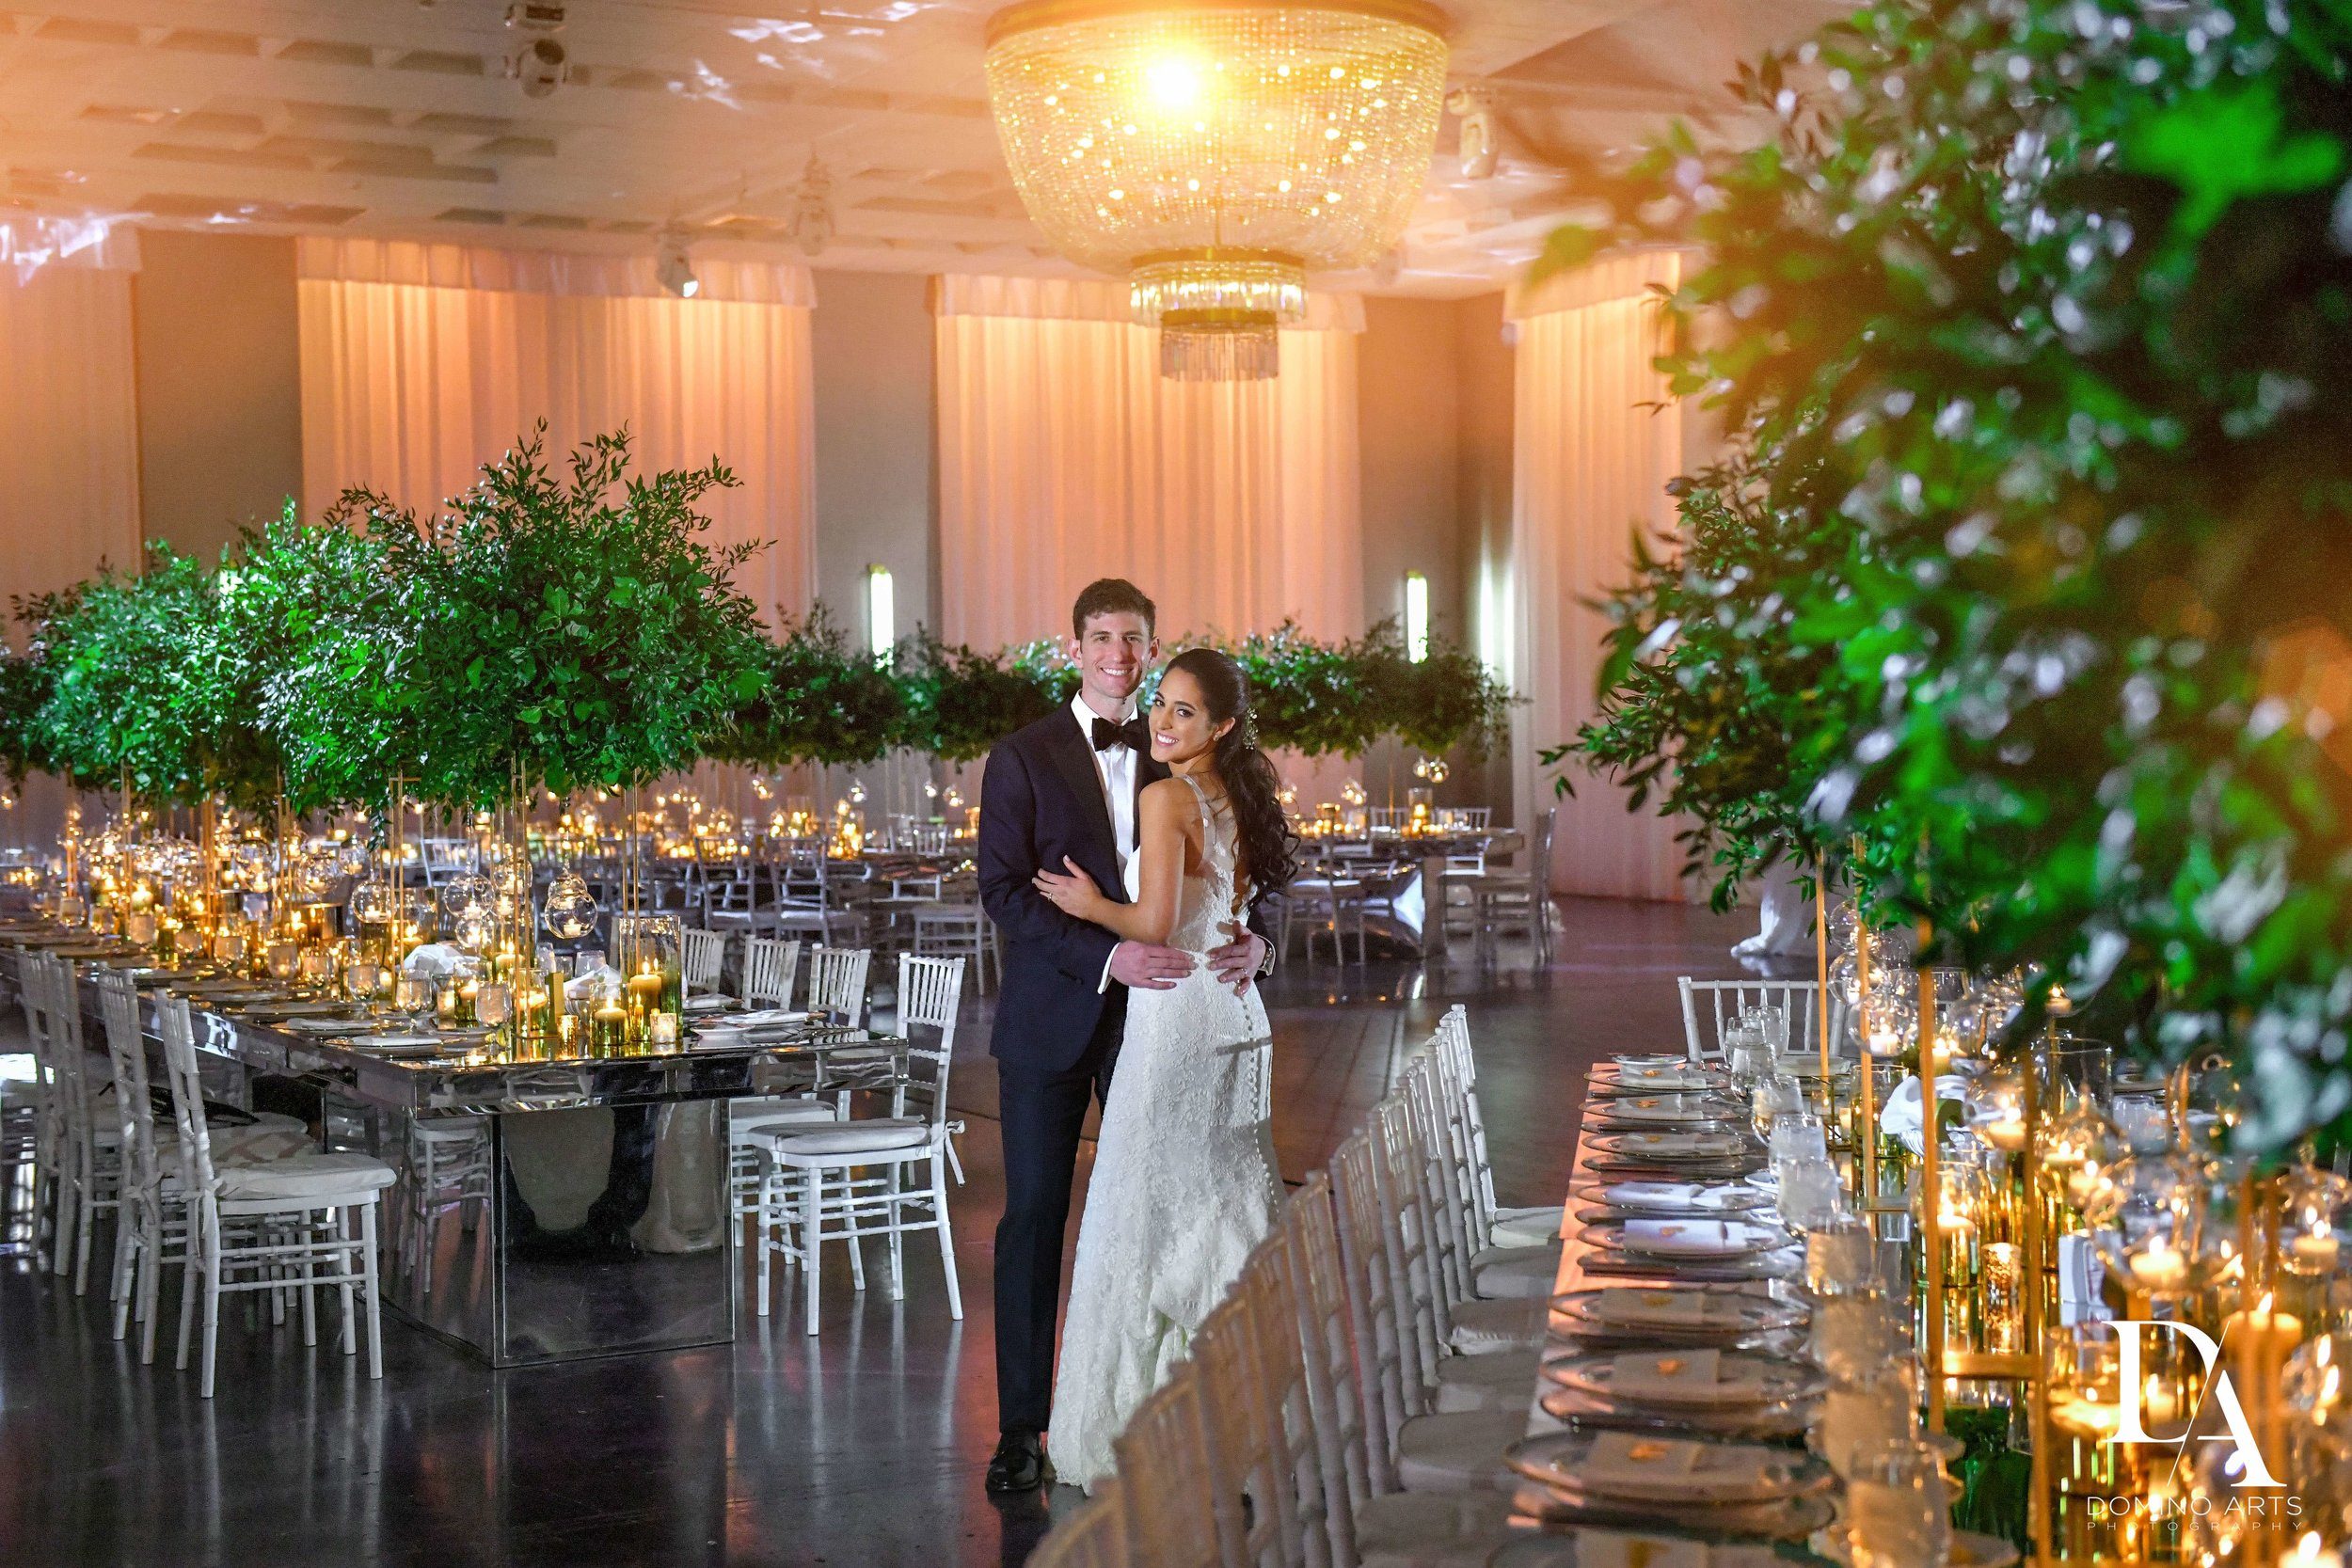 Wedding-Pictures-Emanuel-Luxury-Venue-0954.jpg